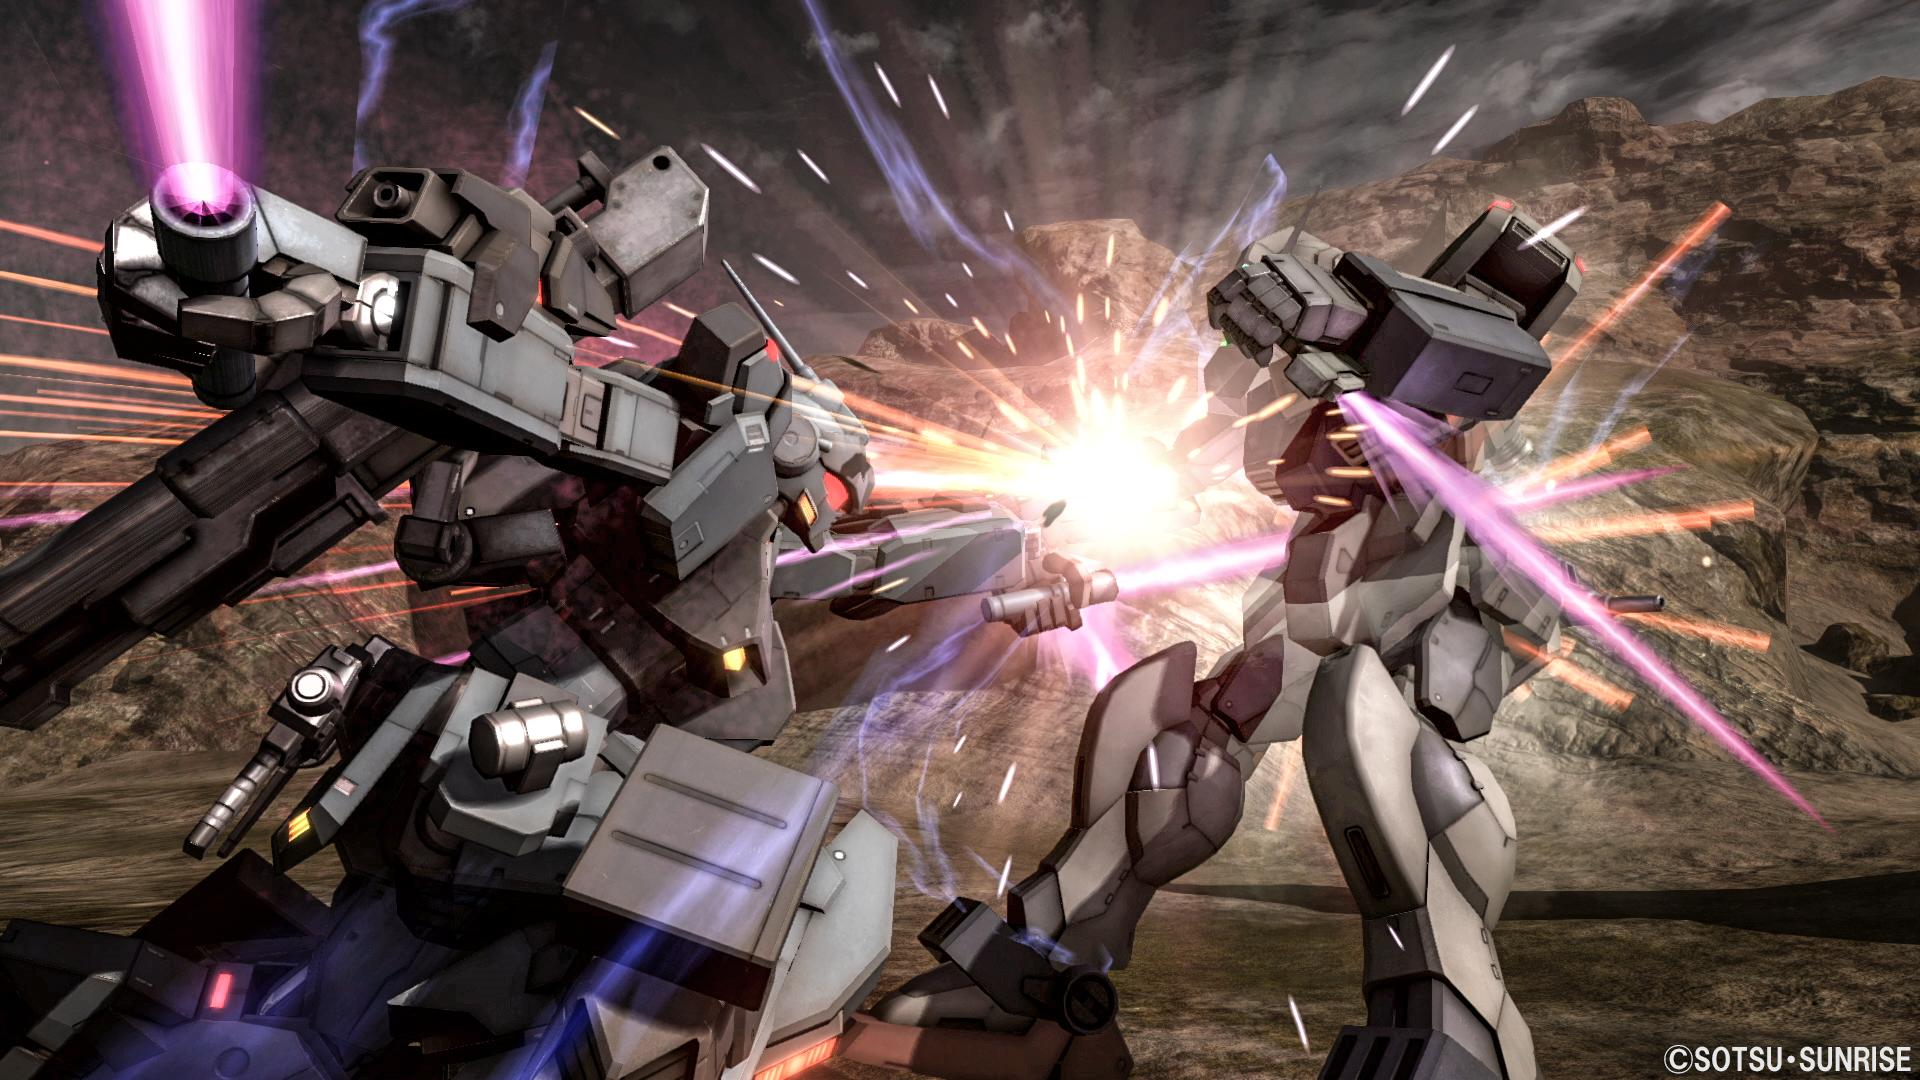 Mobile Suit Gundam Battle Operation 2 desembarcará pronto en Latinoamérica